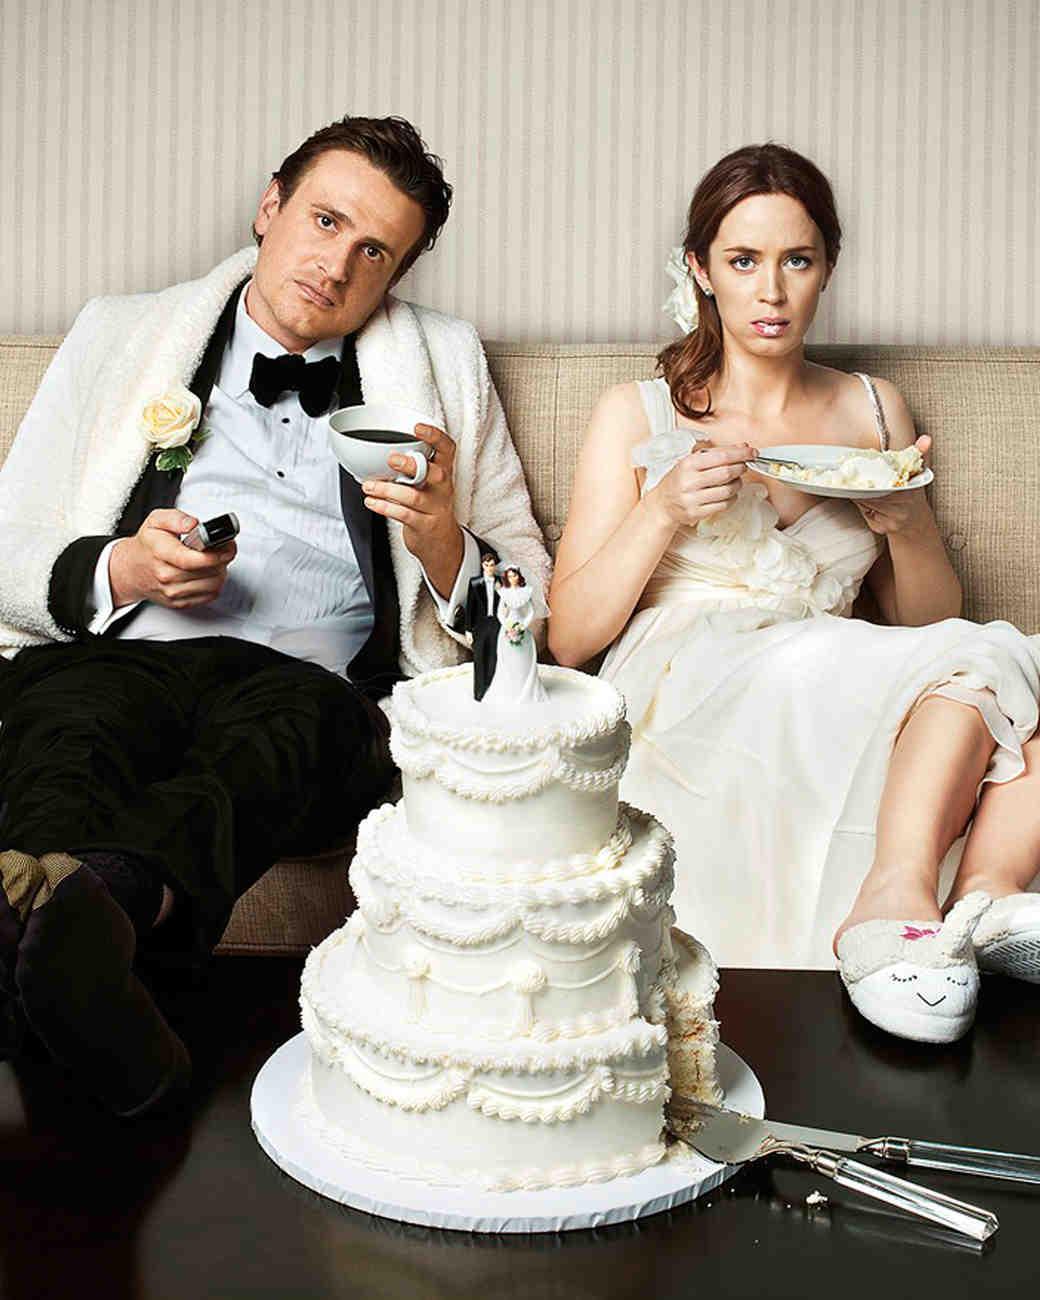 five-year-engagement-movie-jason-segel-emily-blunt-eating-cake-0116.jpg